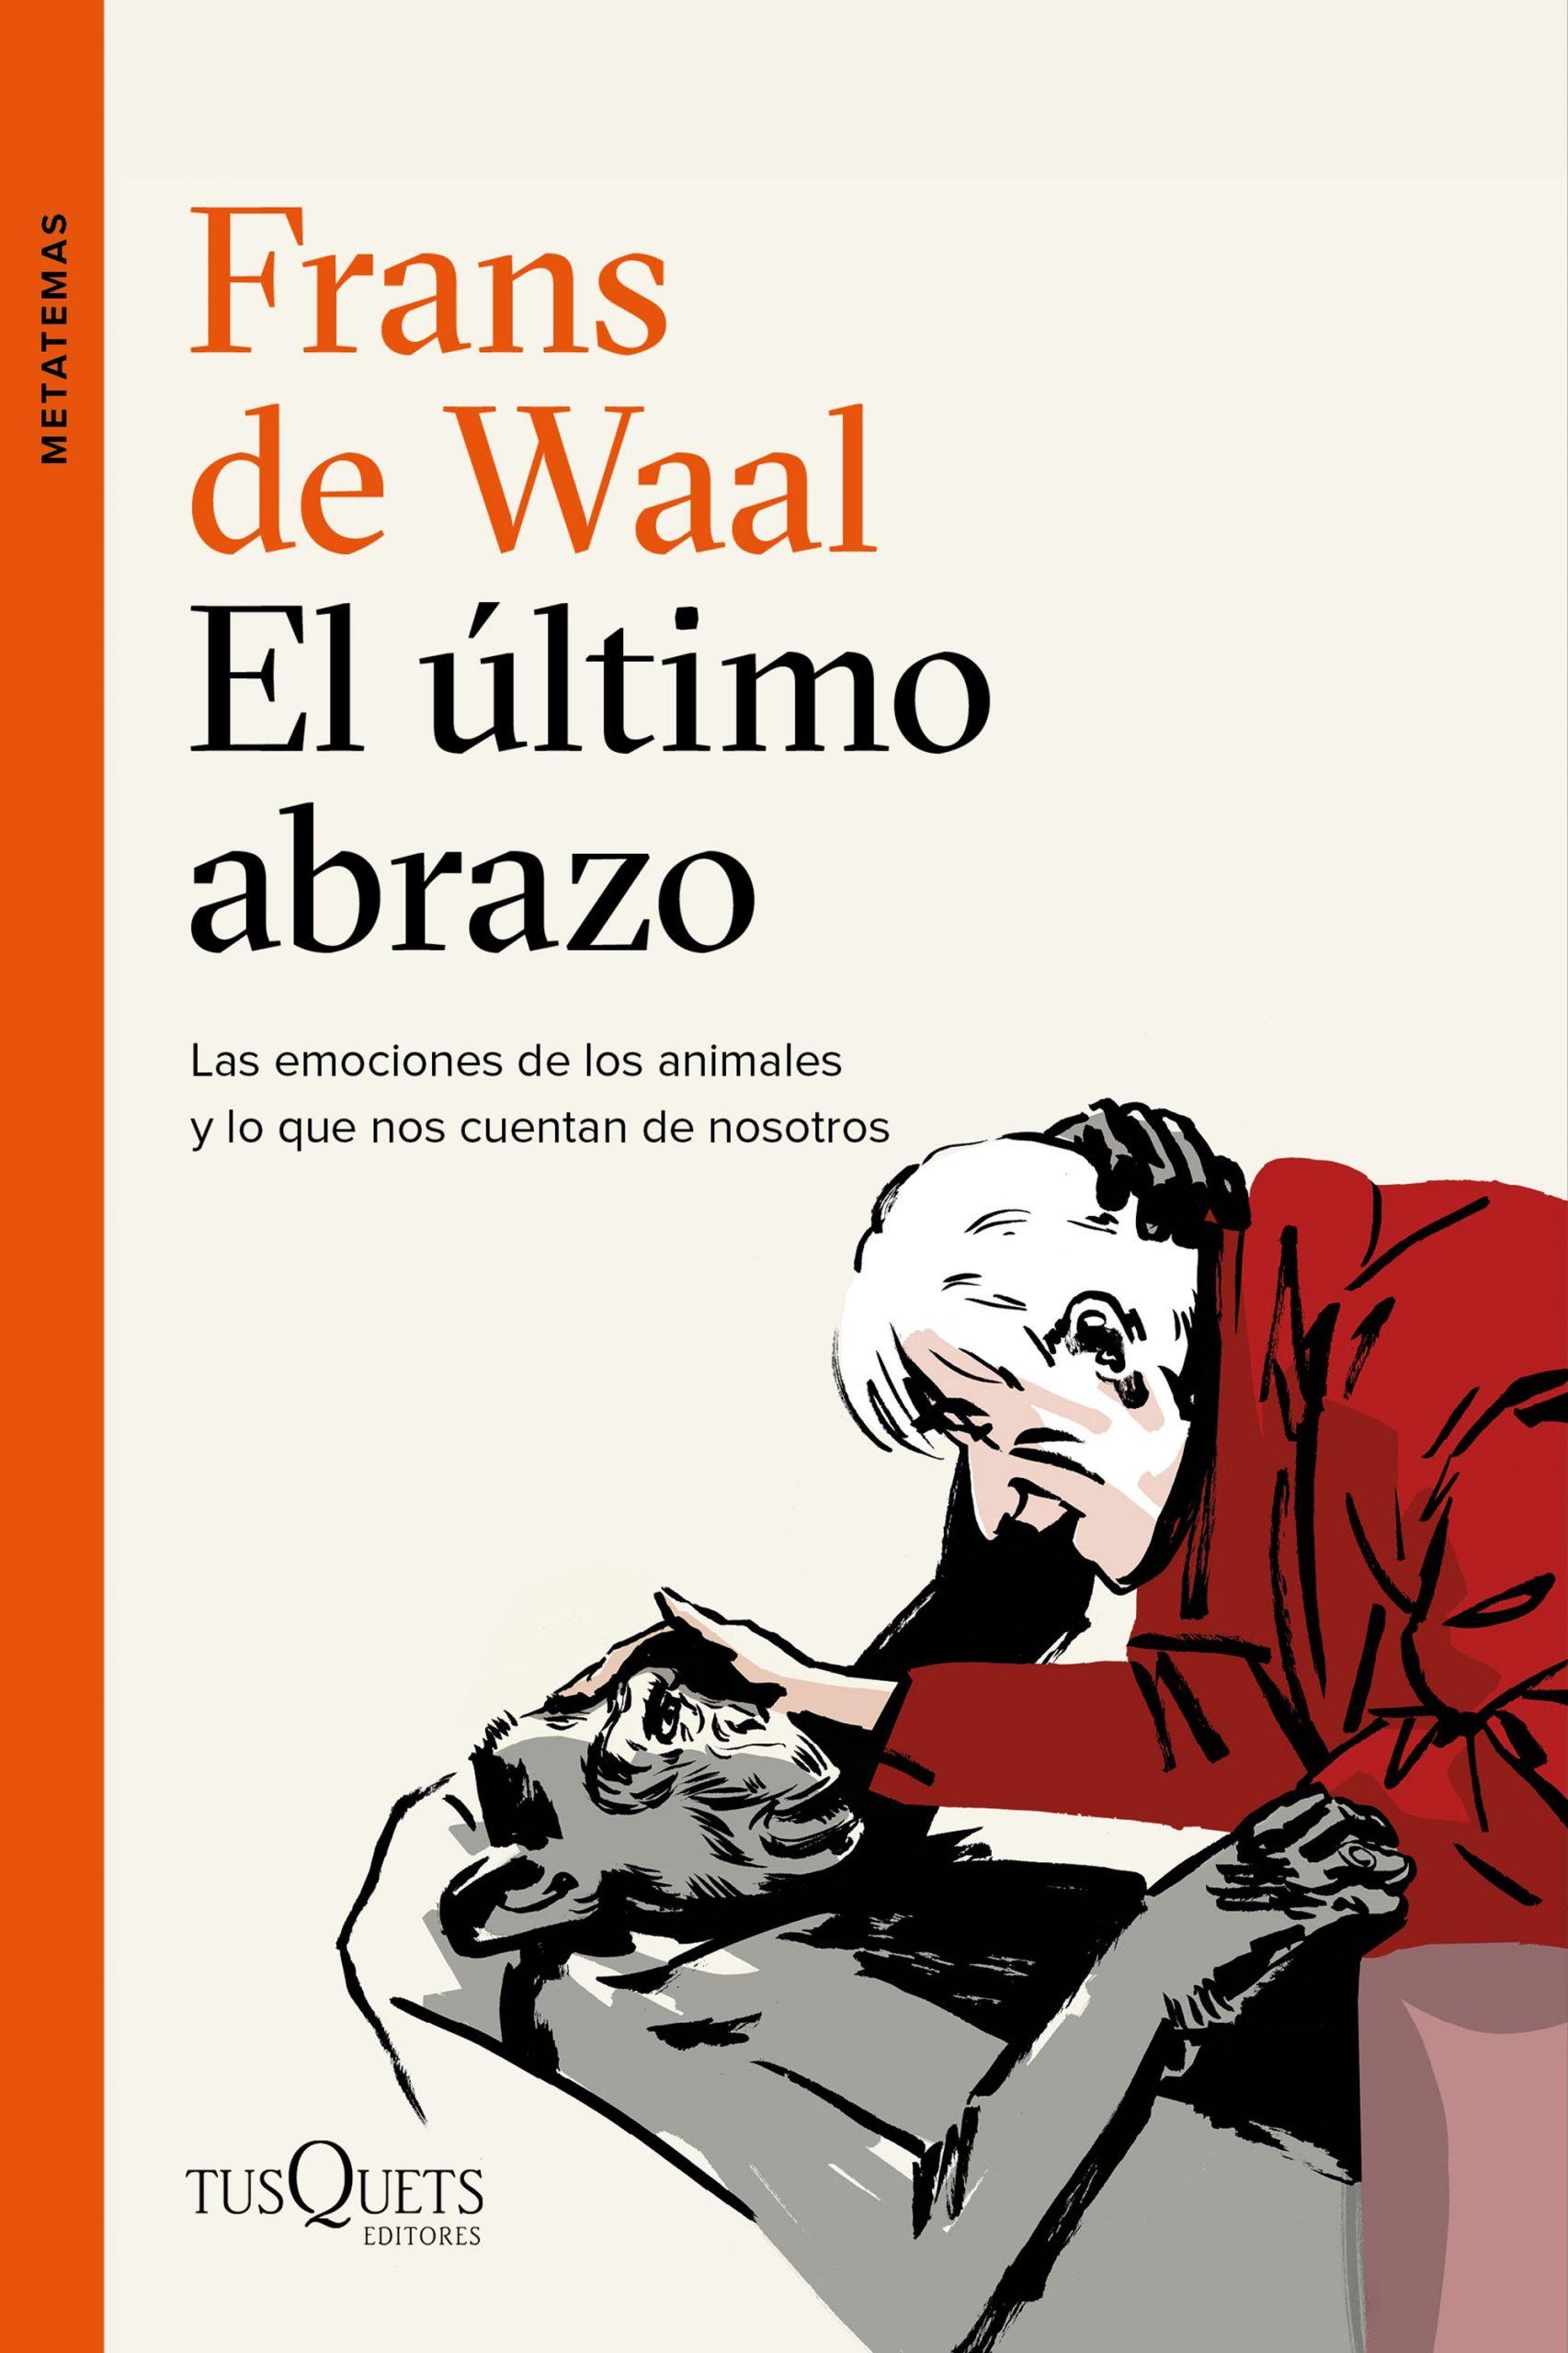 EL ÚLTIMO ABRAZO, de Frans de Waal